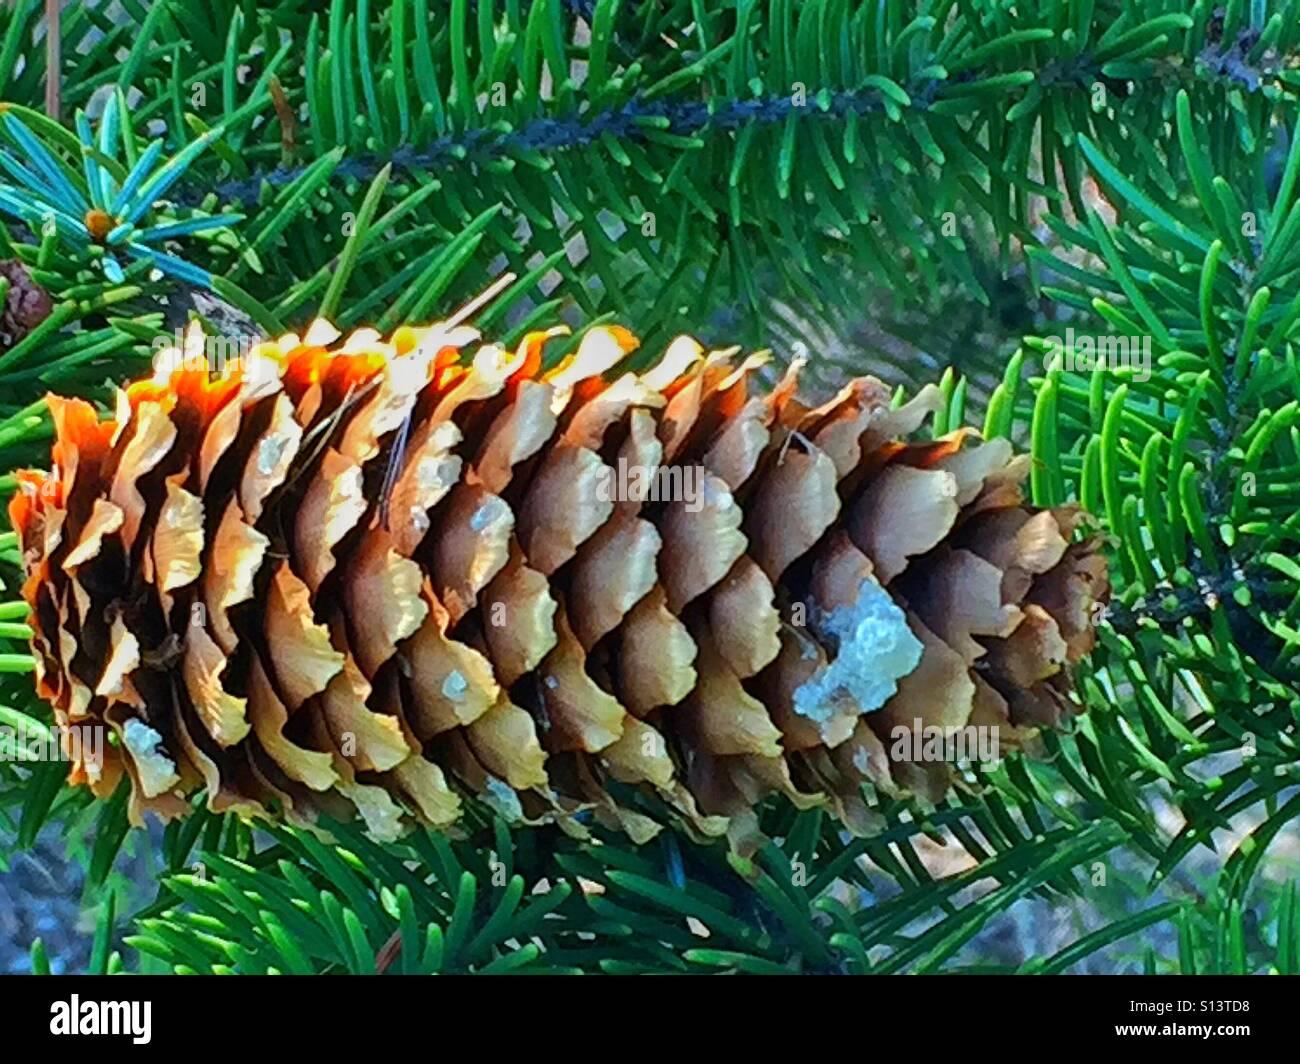 Acorn on an evergreen tree - Stock Image